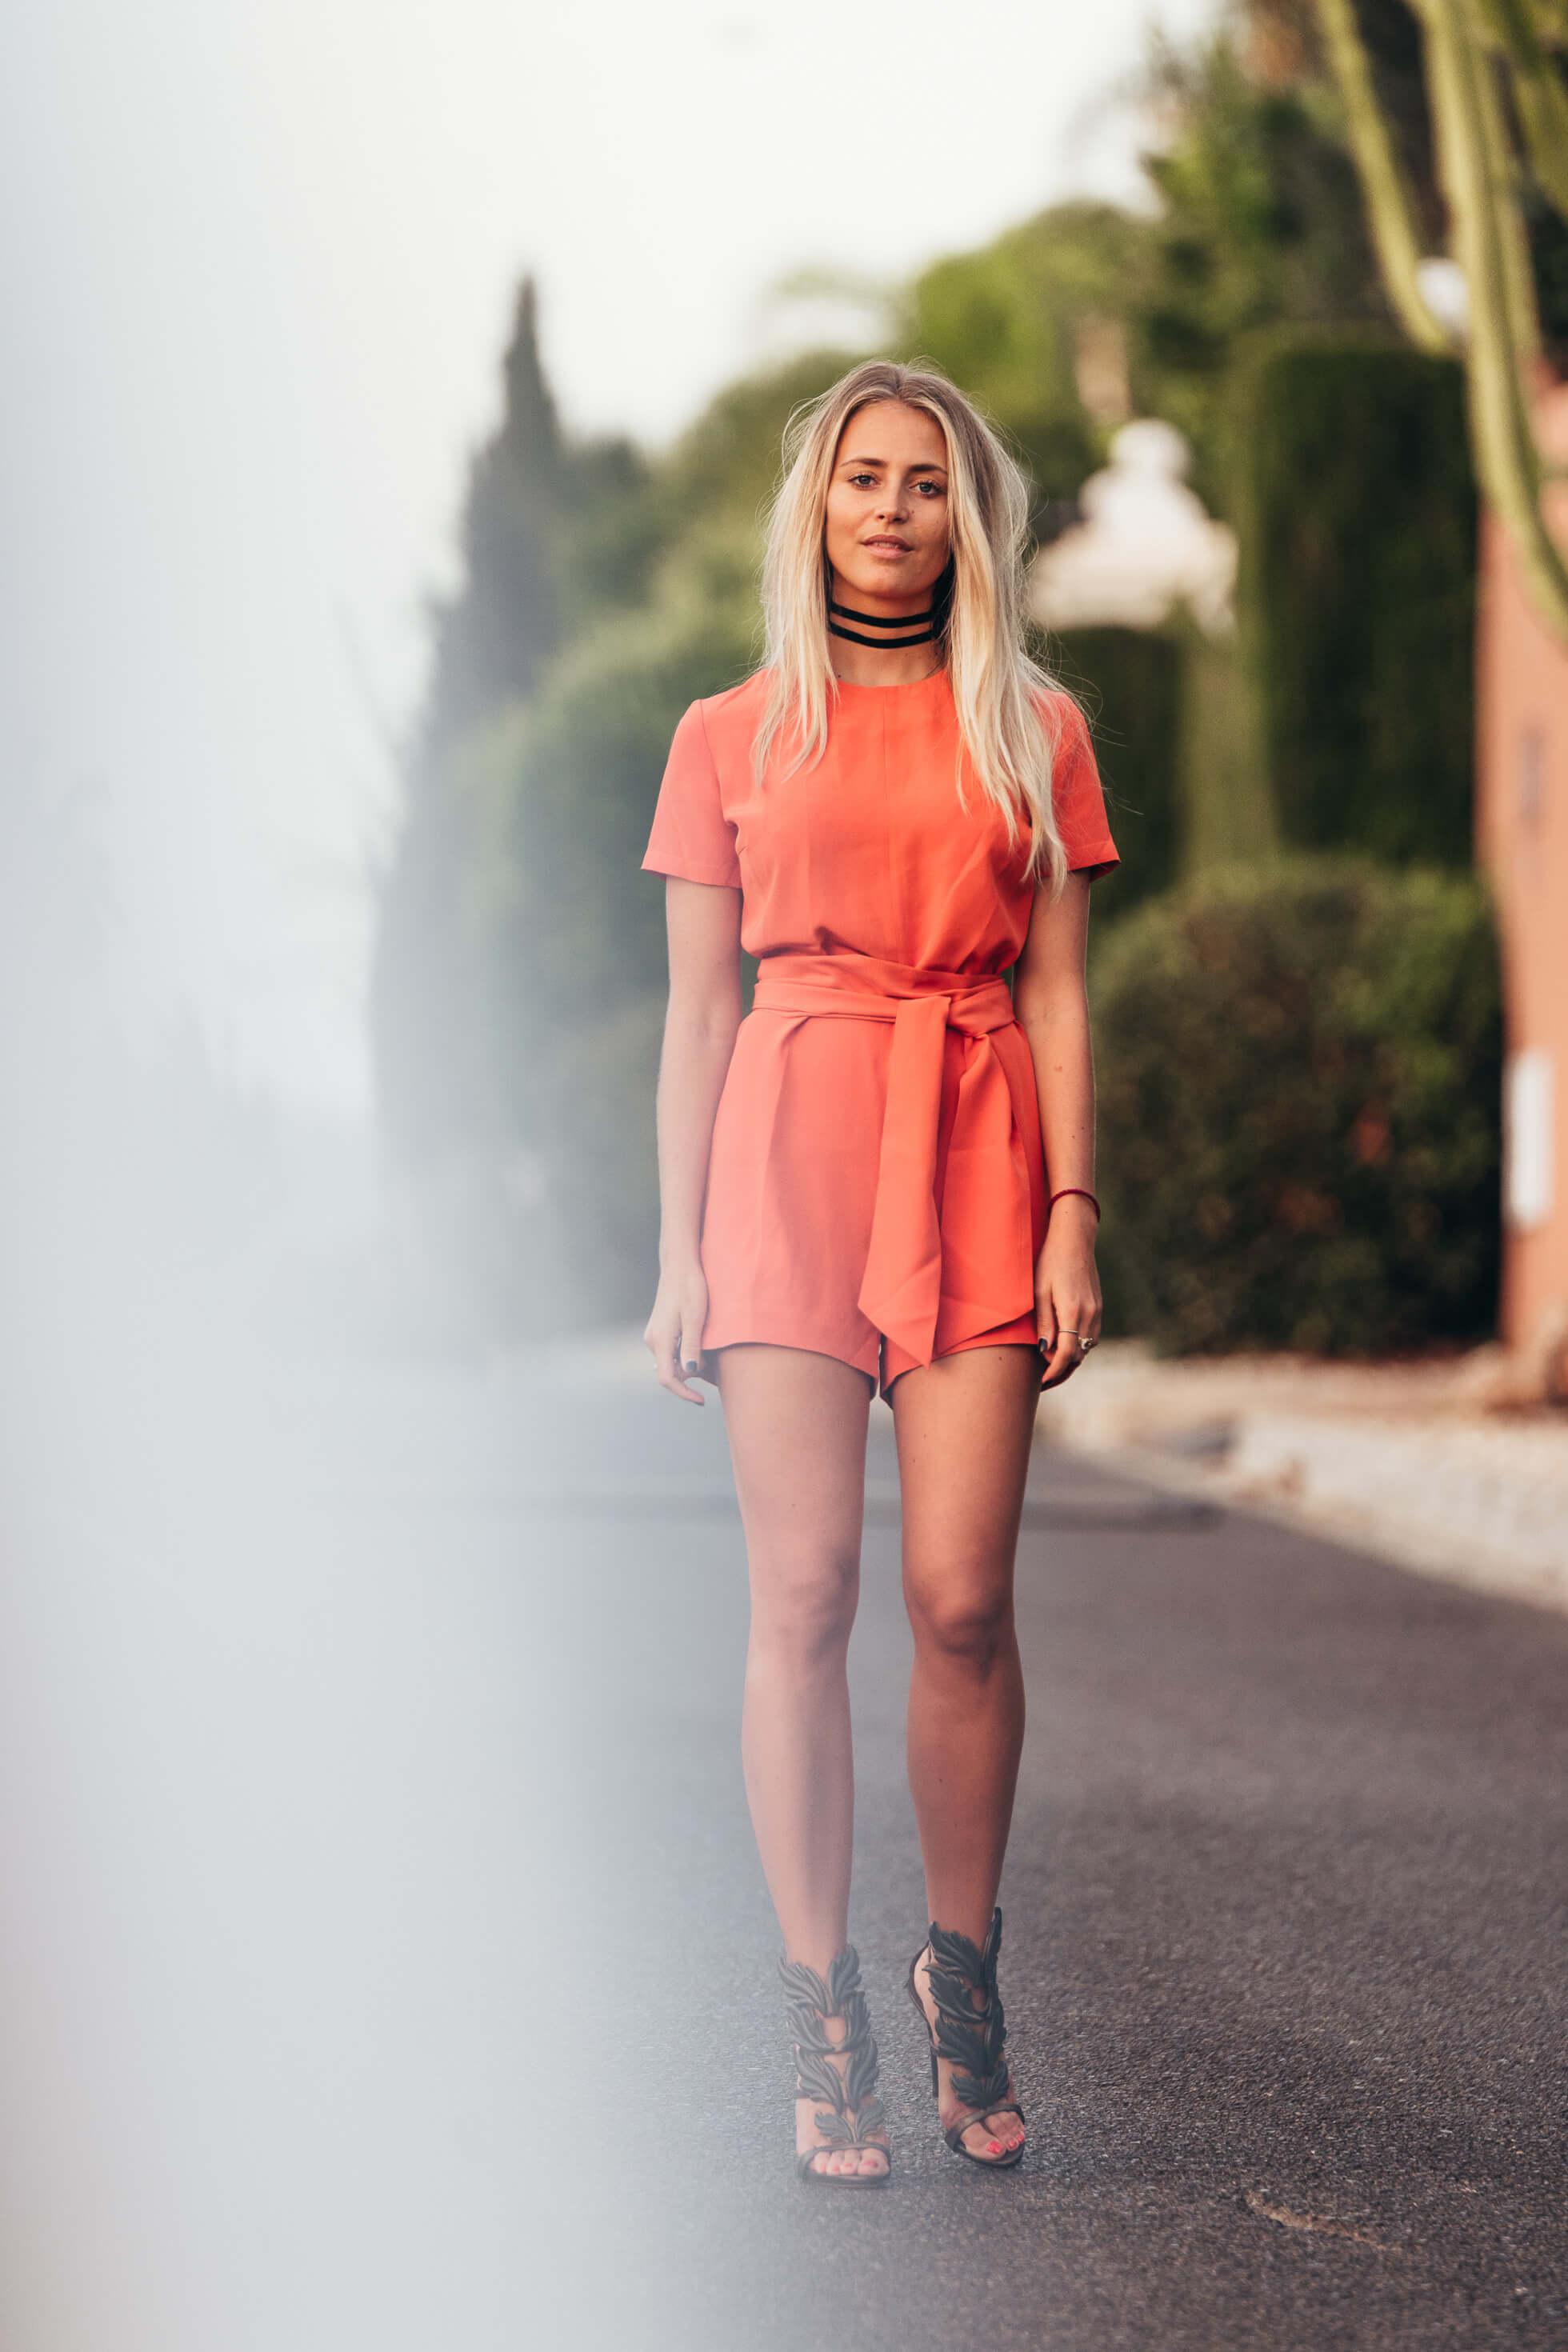 janni-deler-bright-orangej1280374